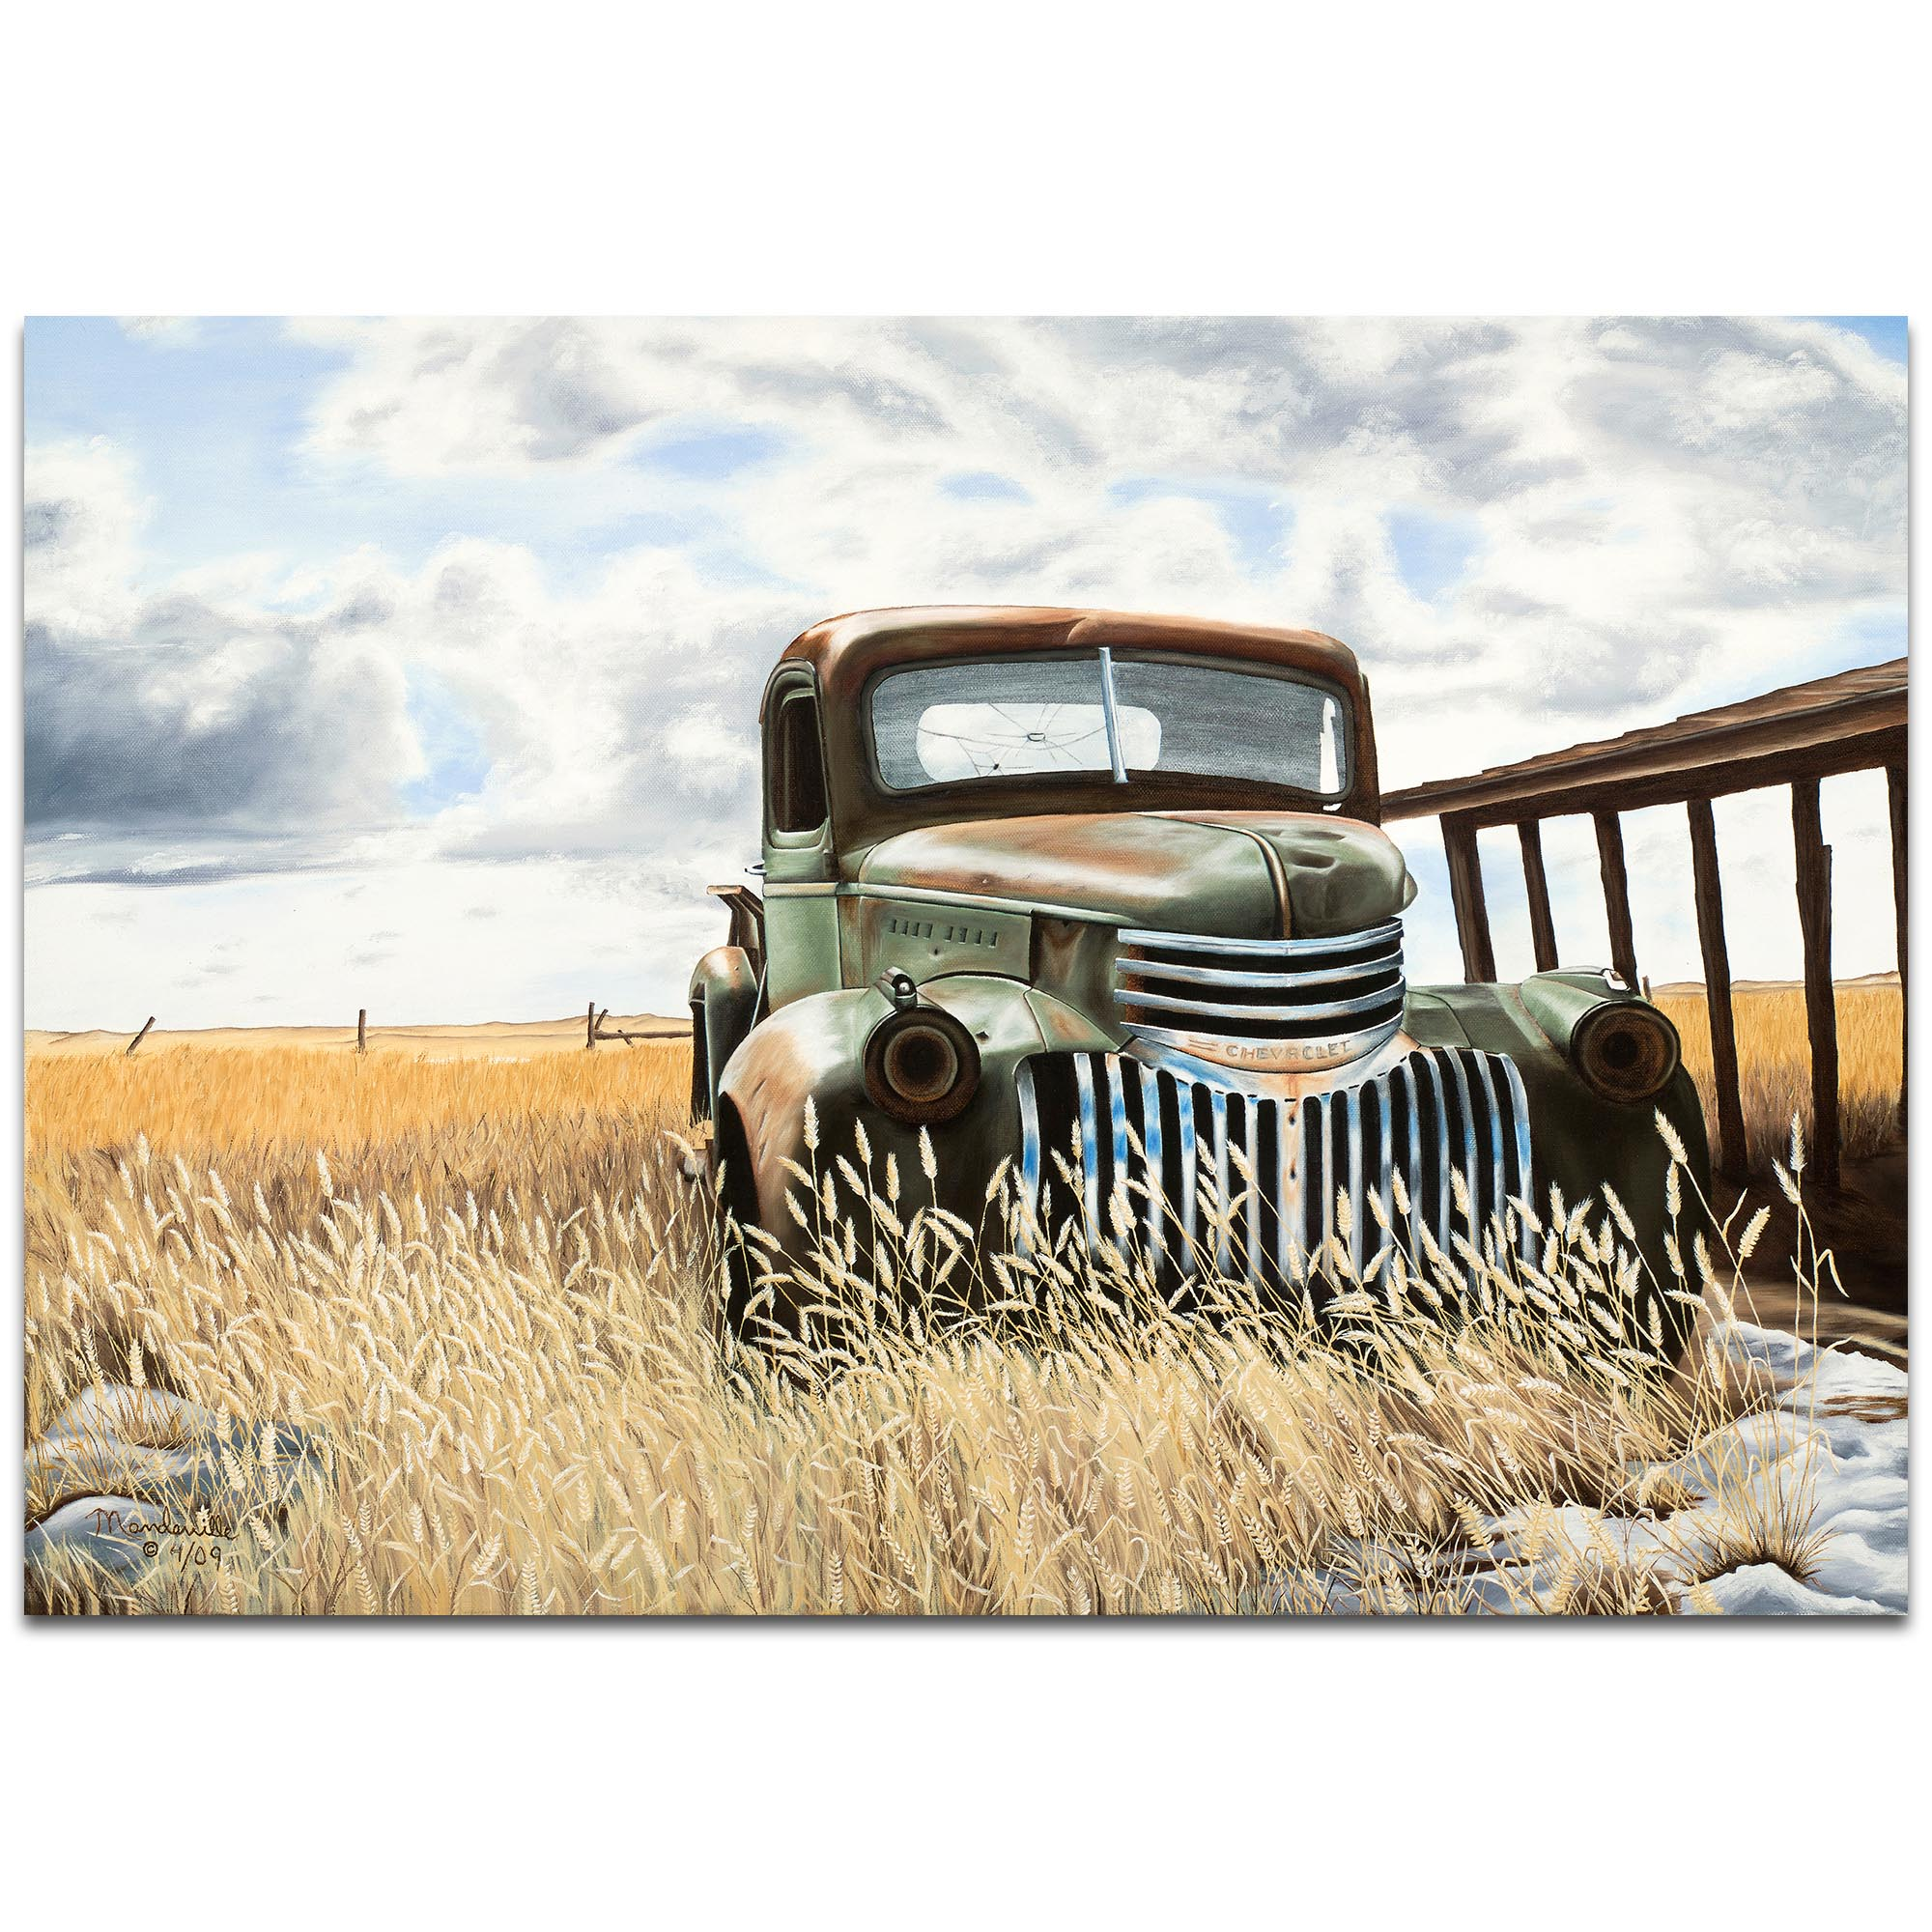 Americana Wall Art 'Swede's Old Truck' - Classic Trucks Decor on Metal or Plexiglass